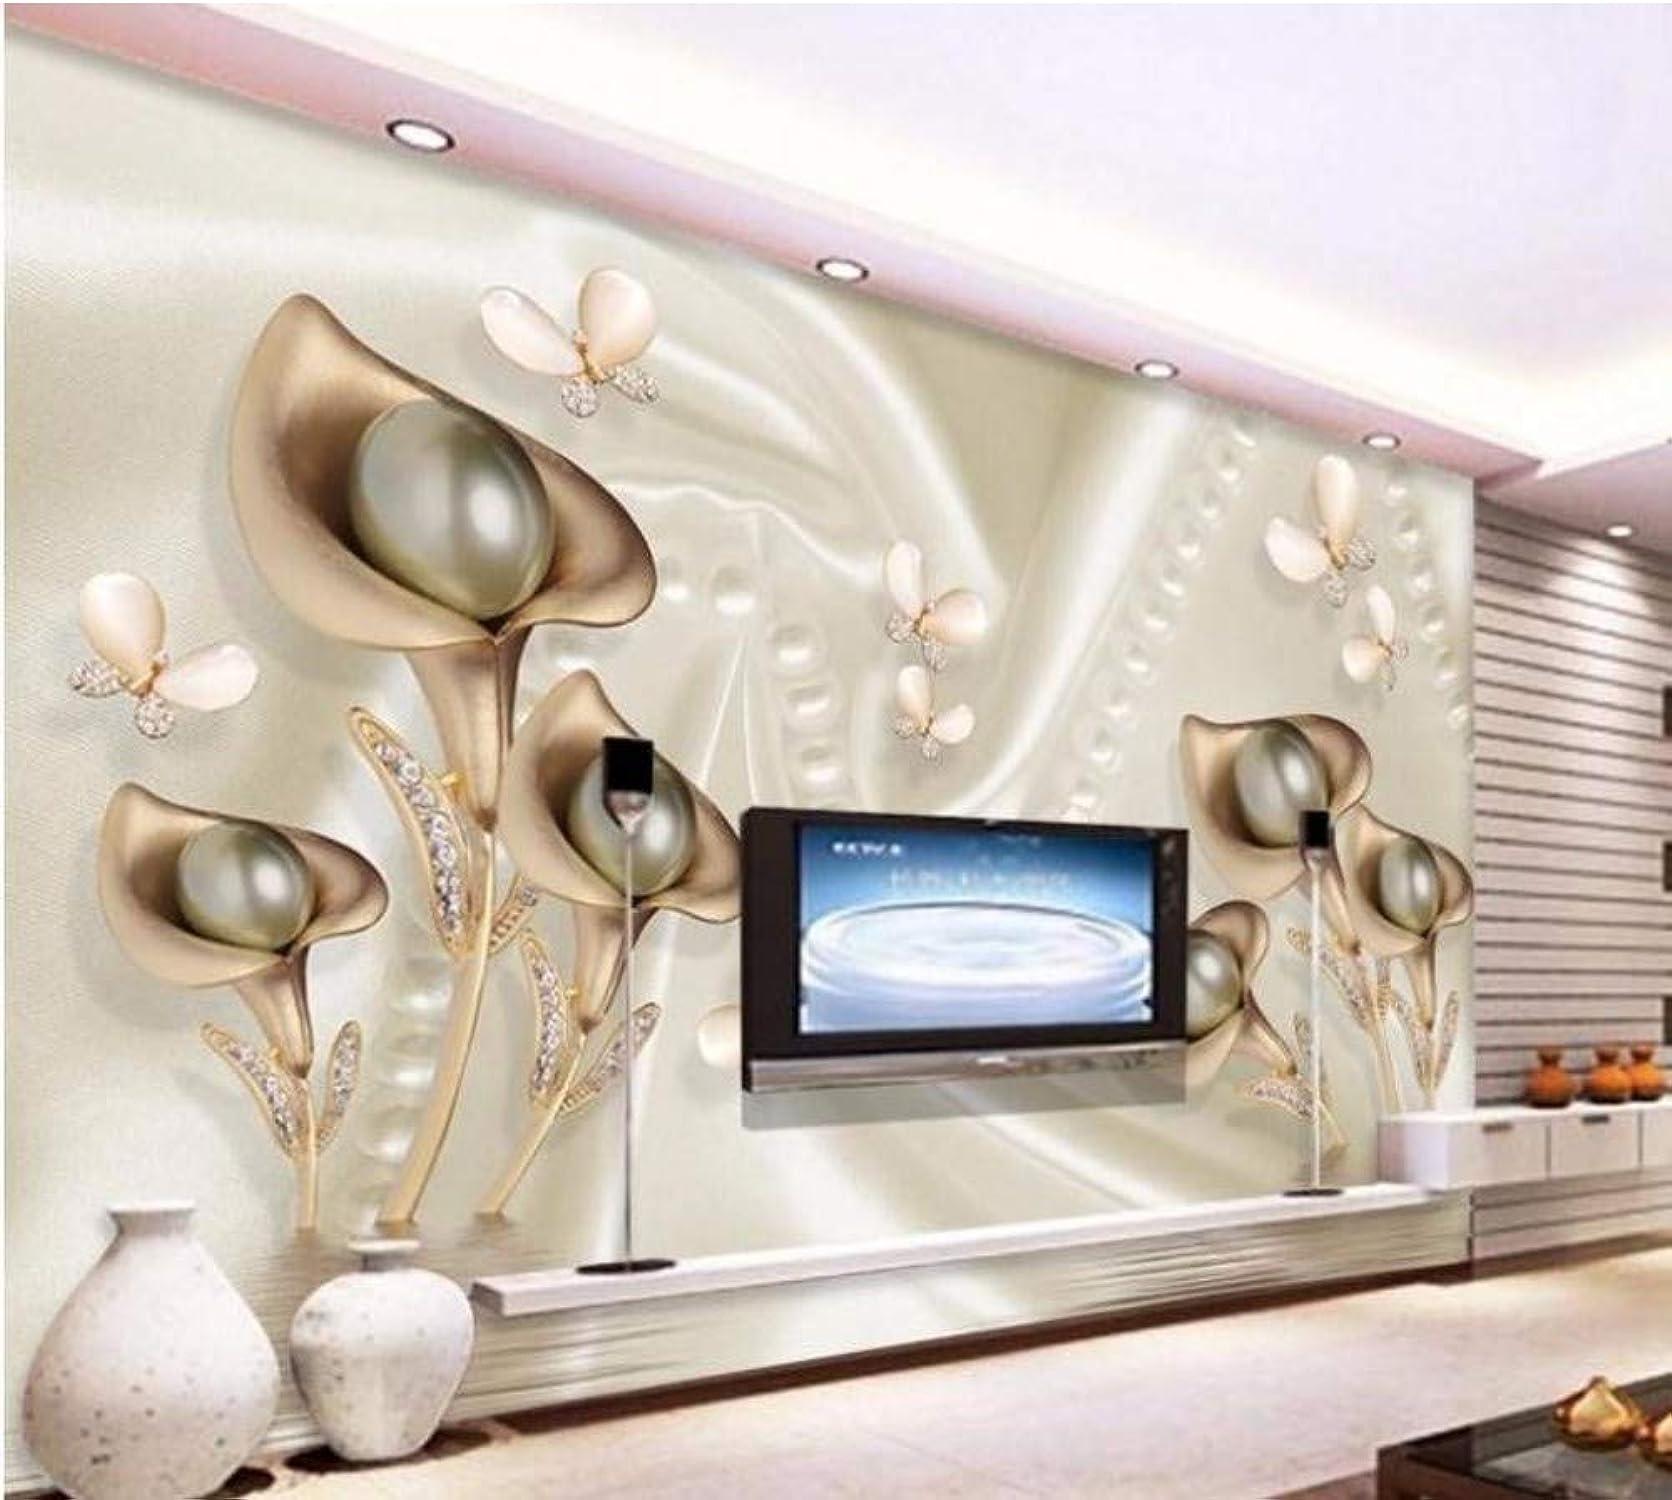 Garantía 100% de ajuste Rureng Rureng Rureng Papel Tapiz Fotográfico Personalizado Mural En 3D Metal Fresco Taste Joyería Tv Papel Tapiz De Fondo Murales Papel Tapiz-200X140Cm  artículos novedosos